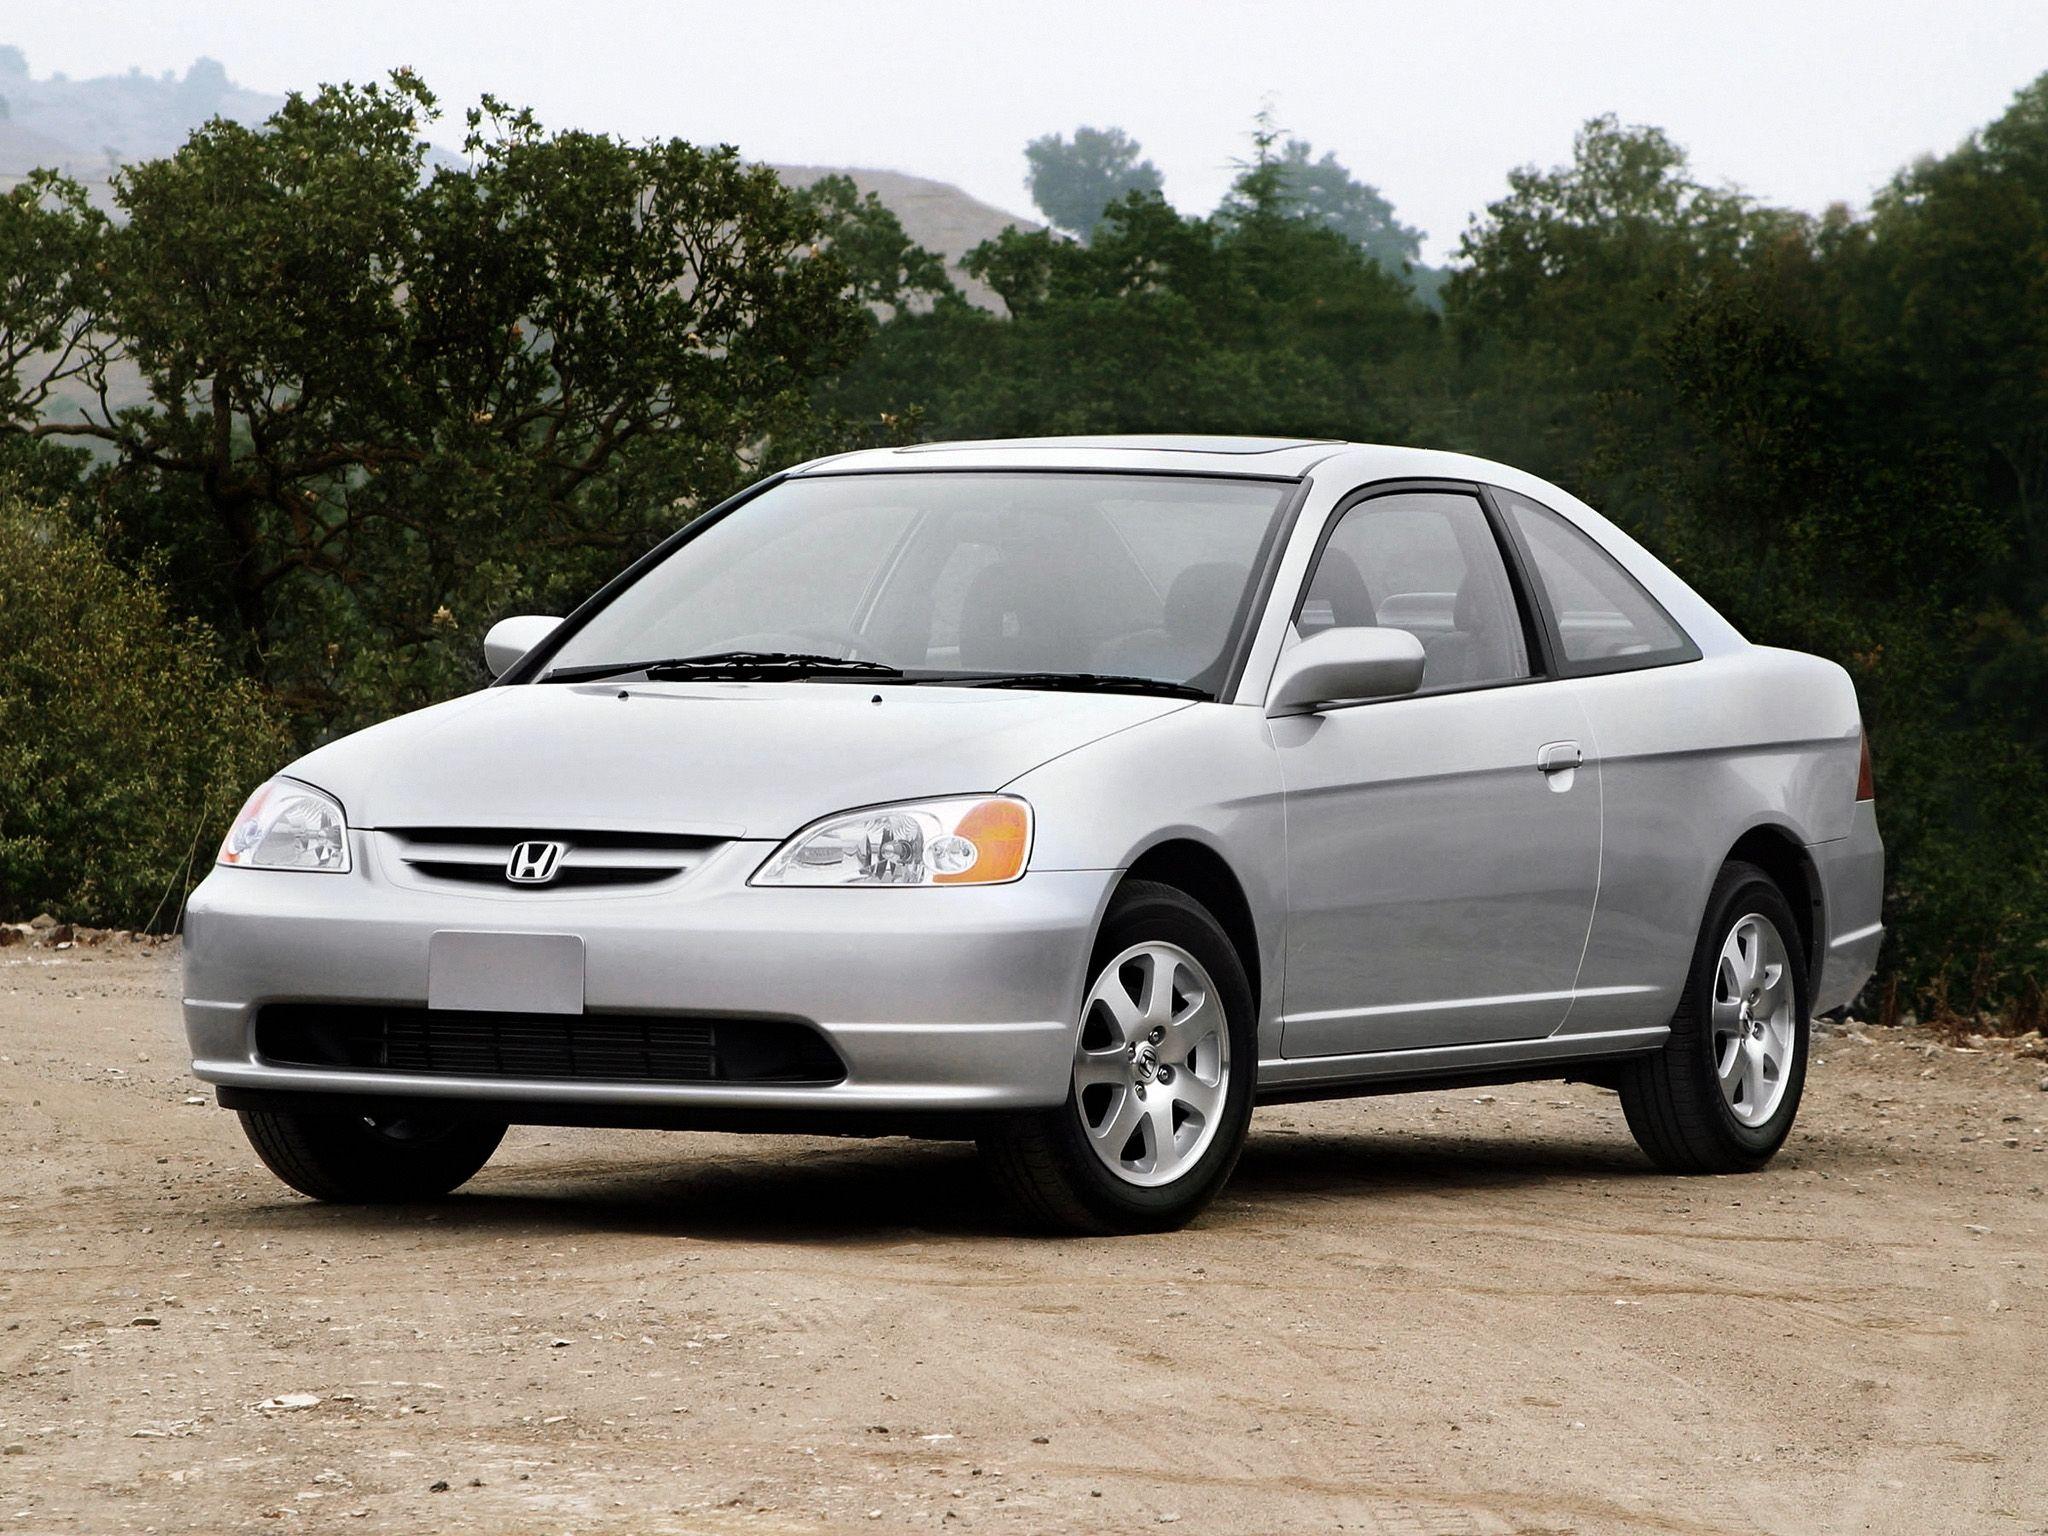 Enchanting 2001 Honda Civic Mpg Photos Gallery | Honda | Pinterest ...